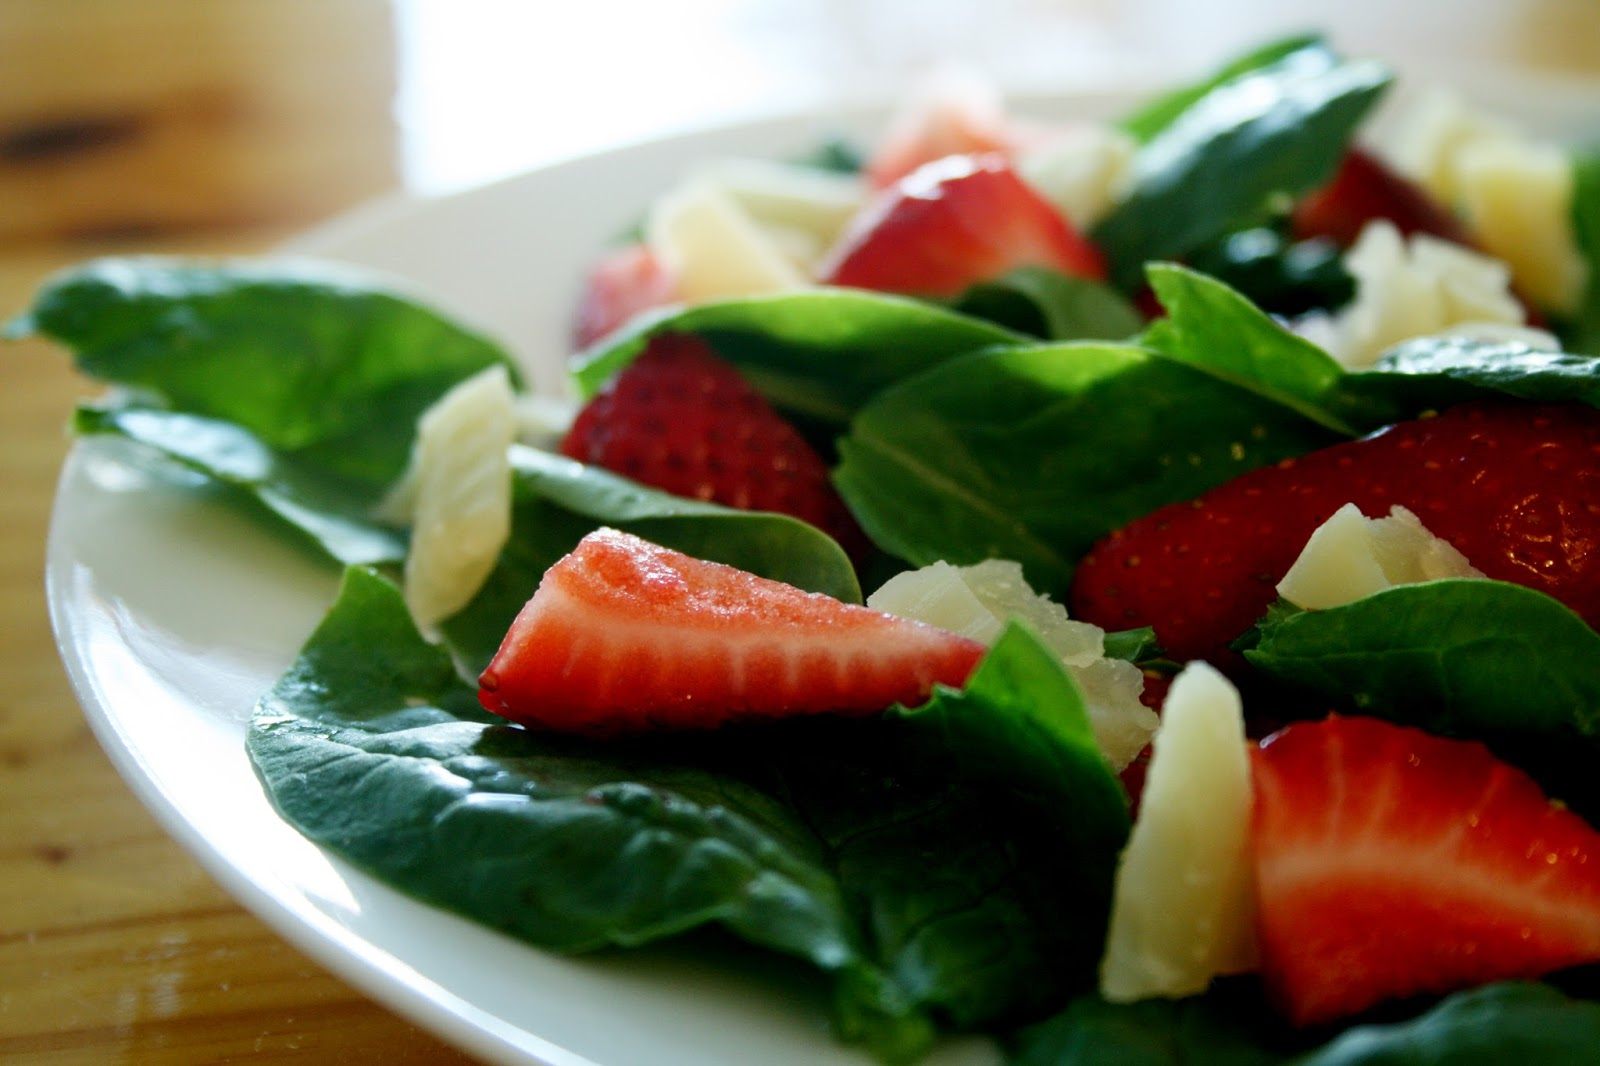 Salad garnished with strawberries